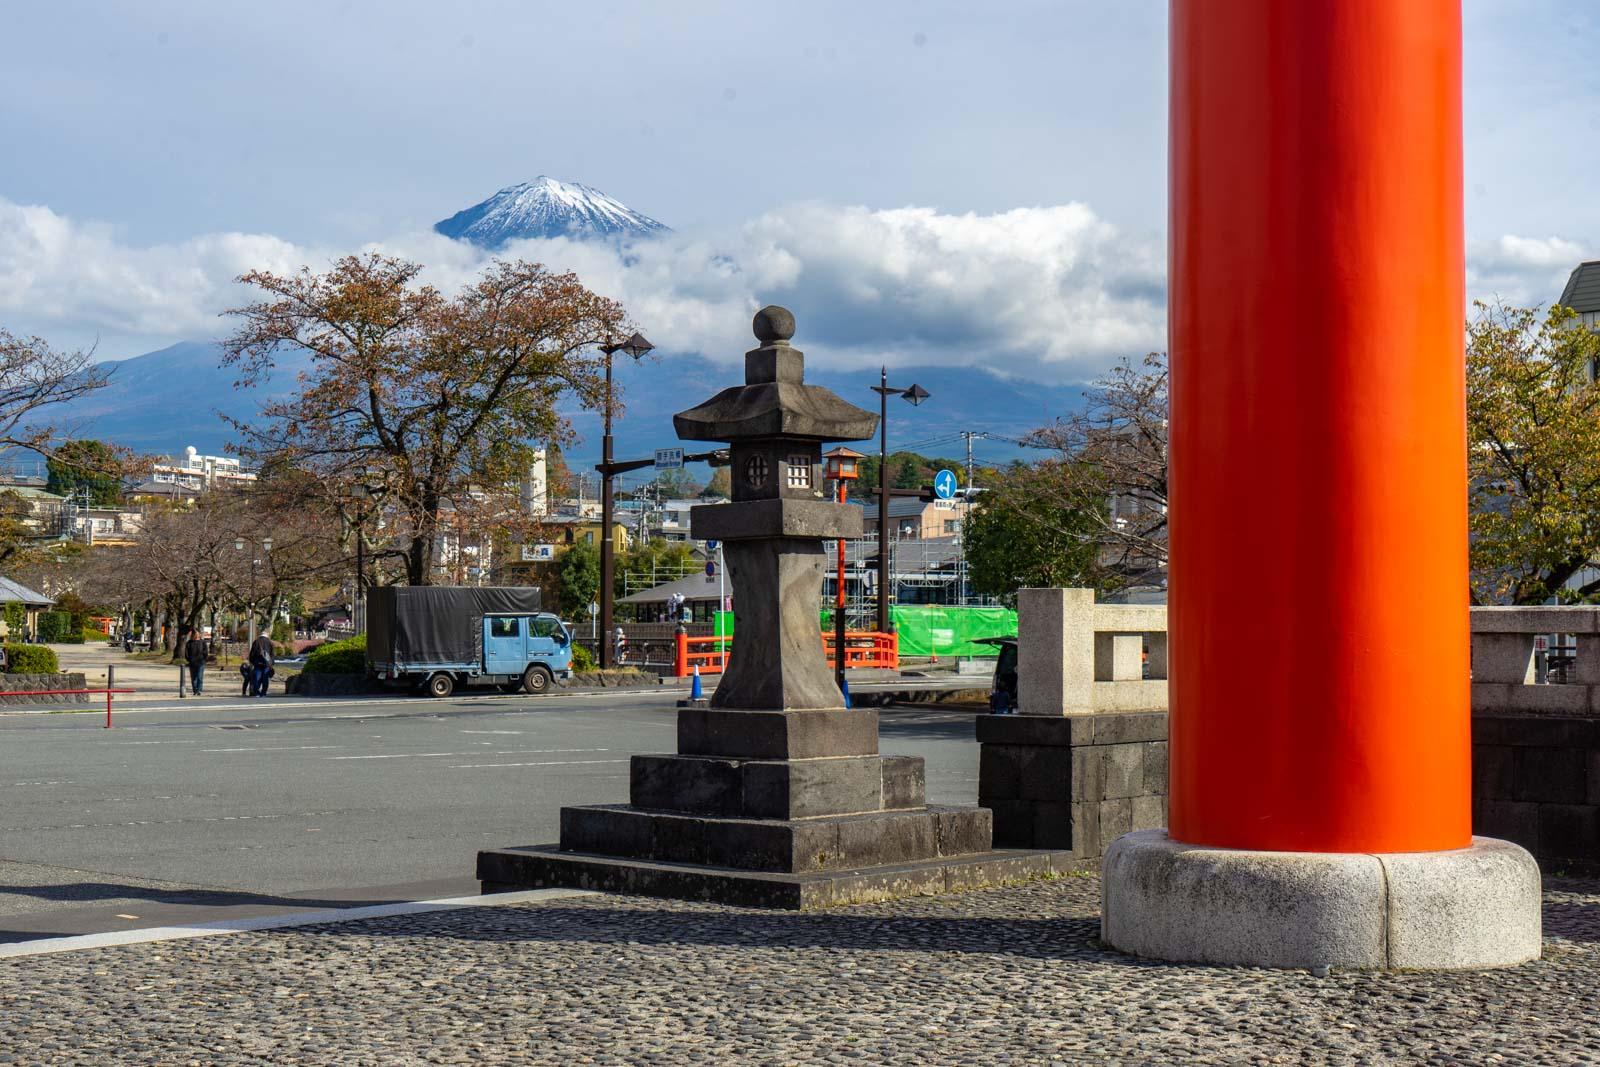 Things to do around Fuji and Fujinomiya, Japan